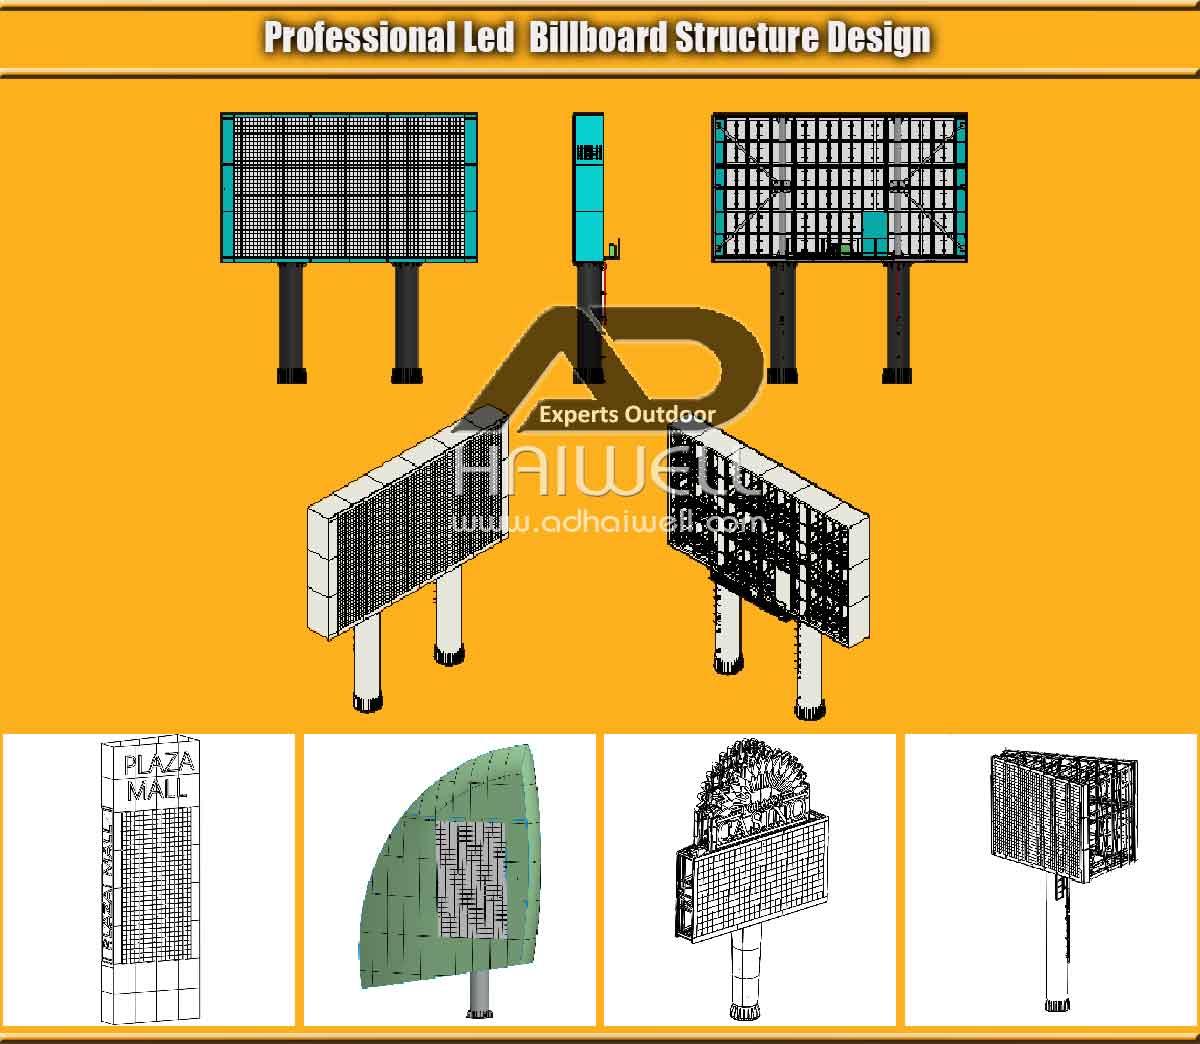 Professionale-LED-Billboard-Structure-Design